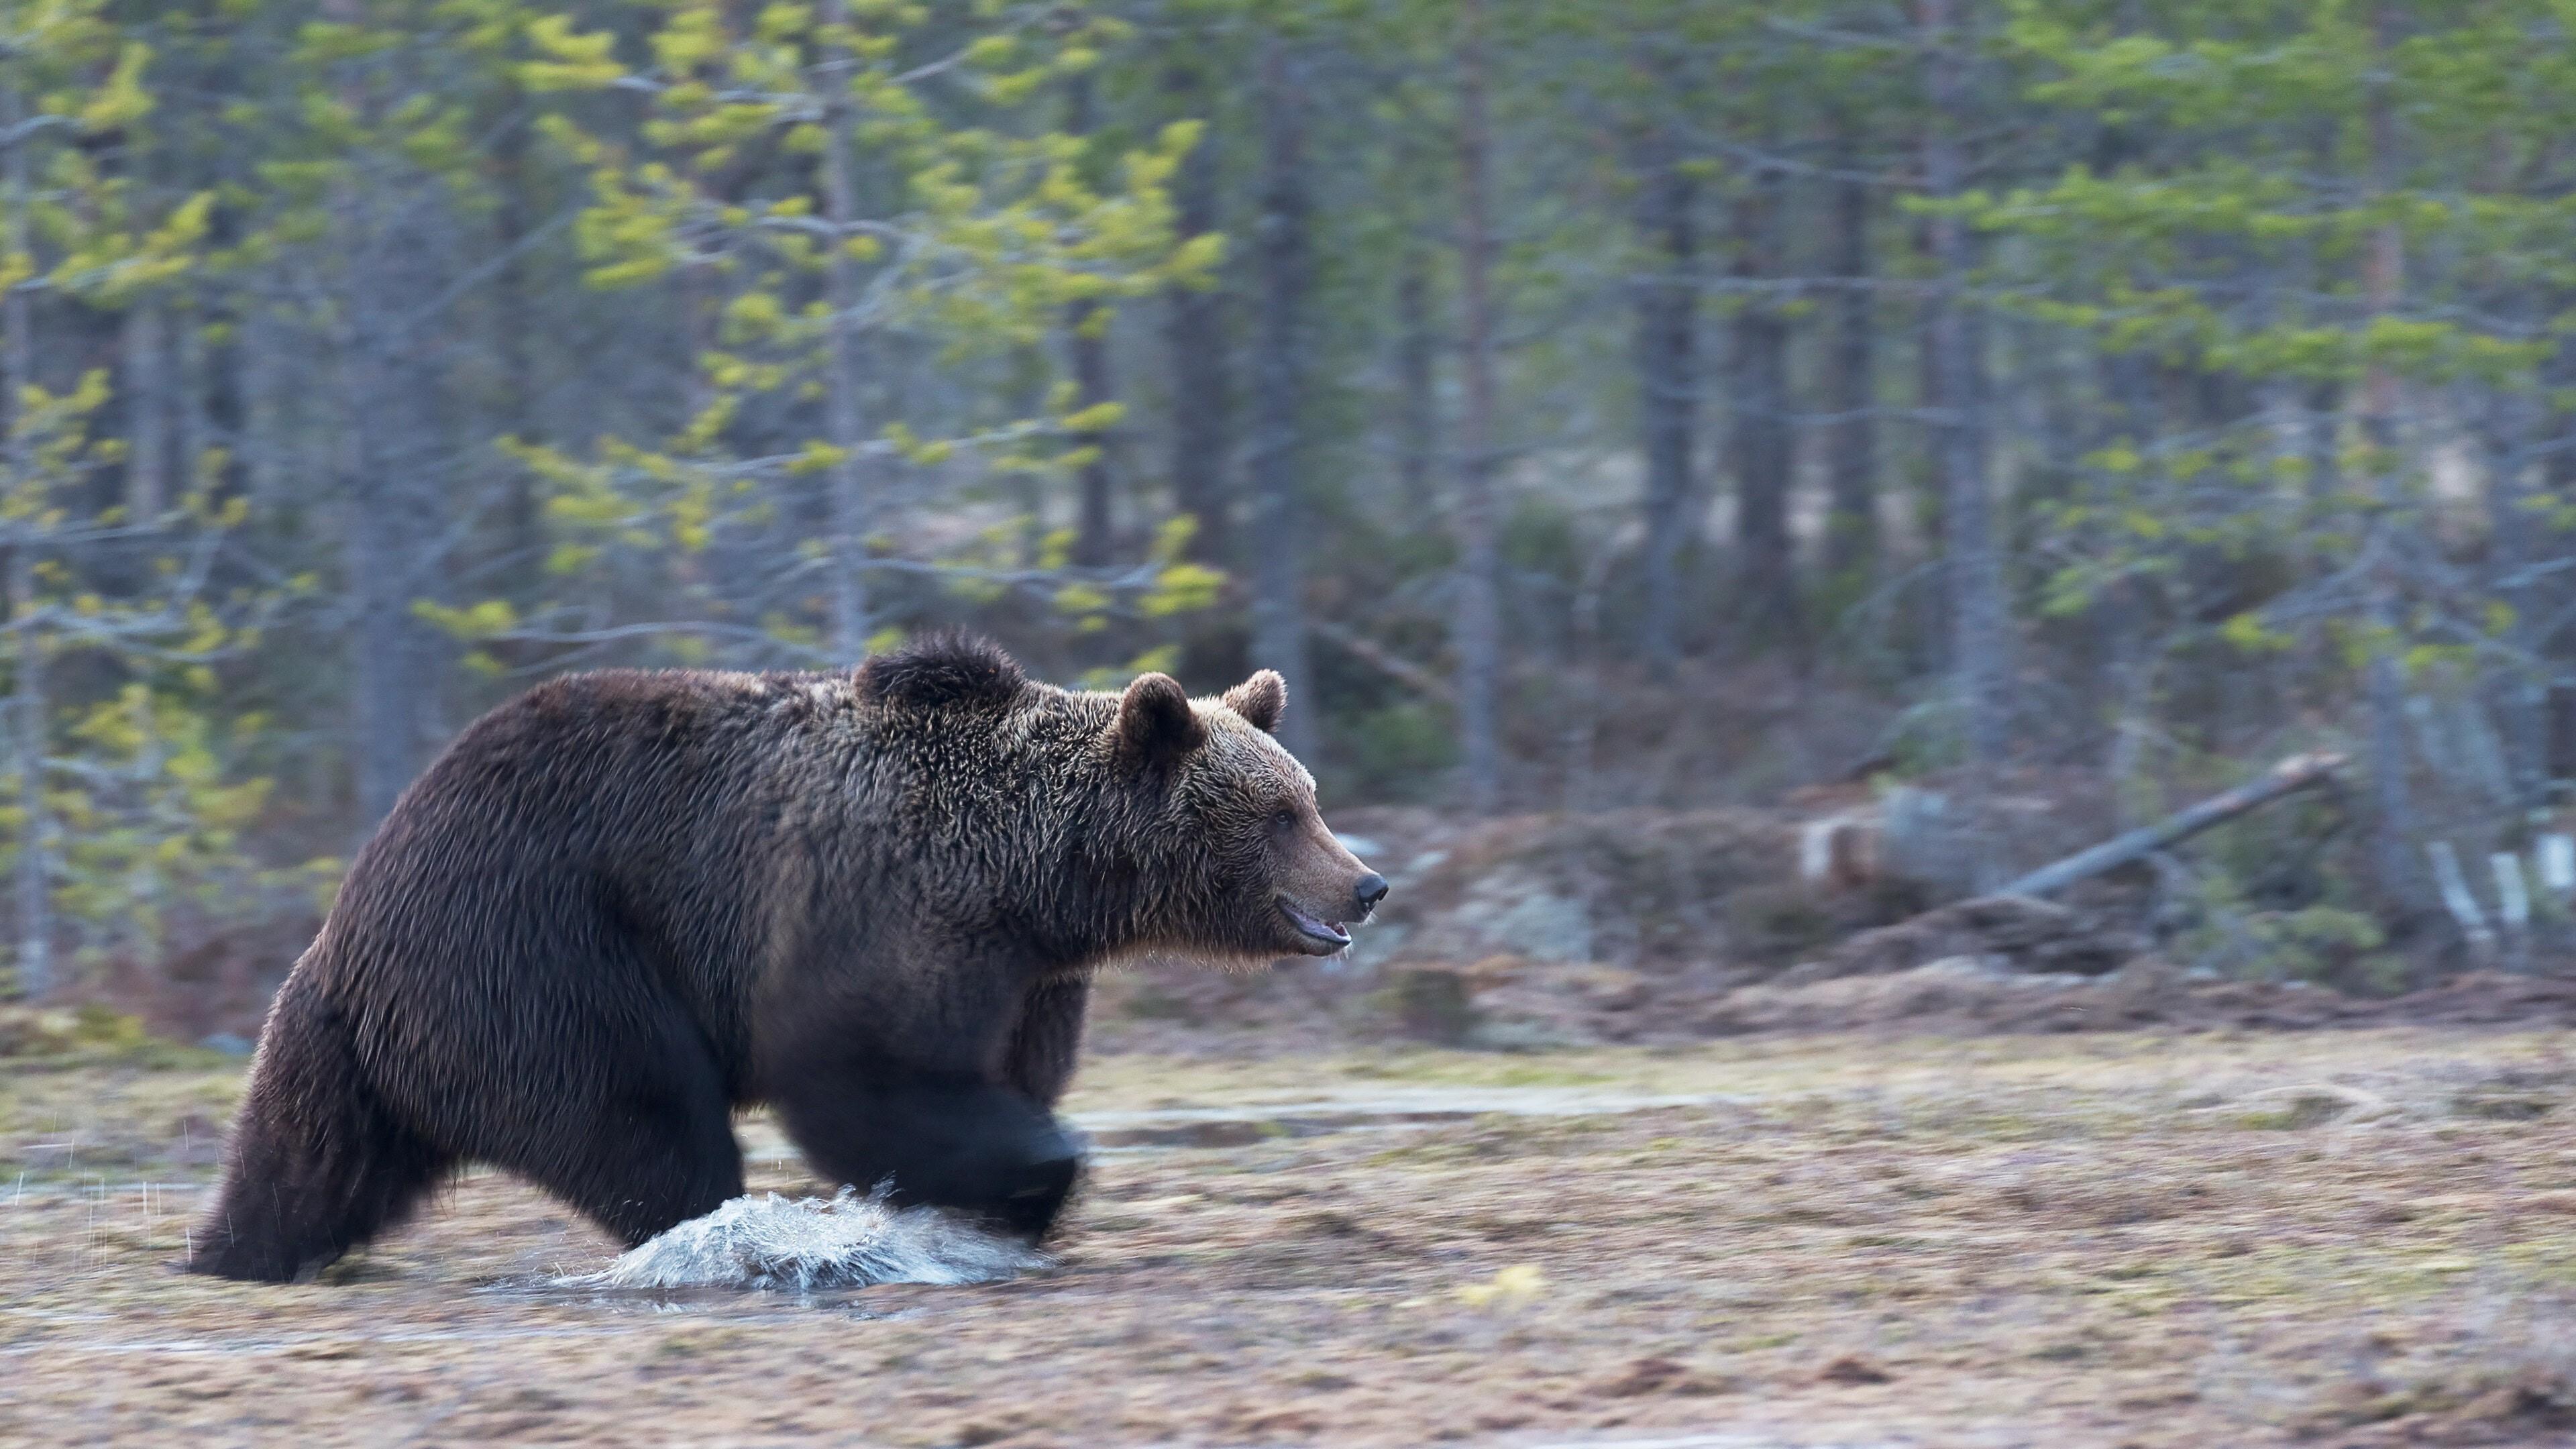 Bear In Forest River 4k Wallpaper Hd Wallpapers